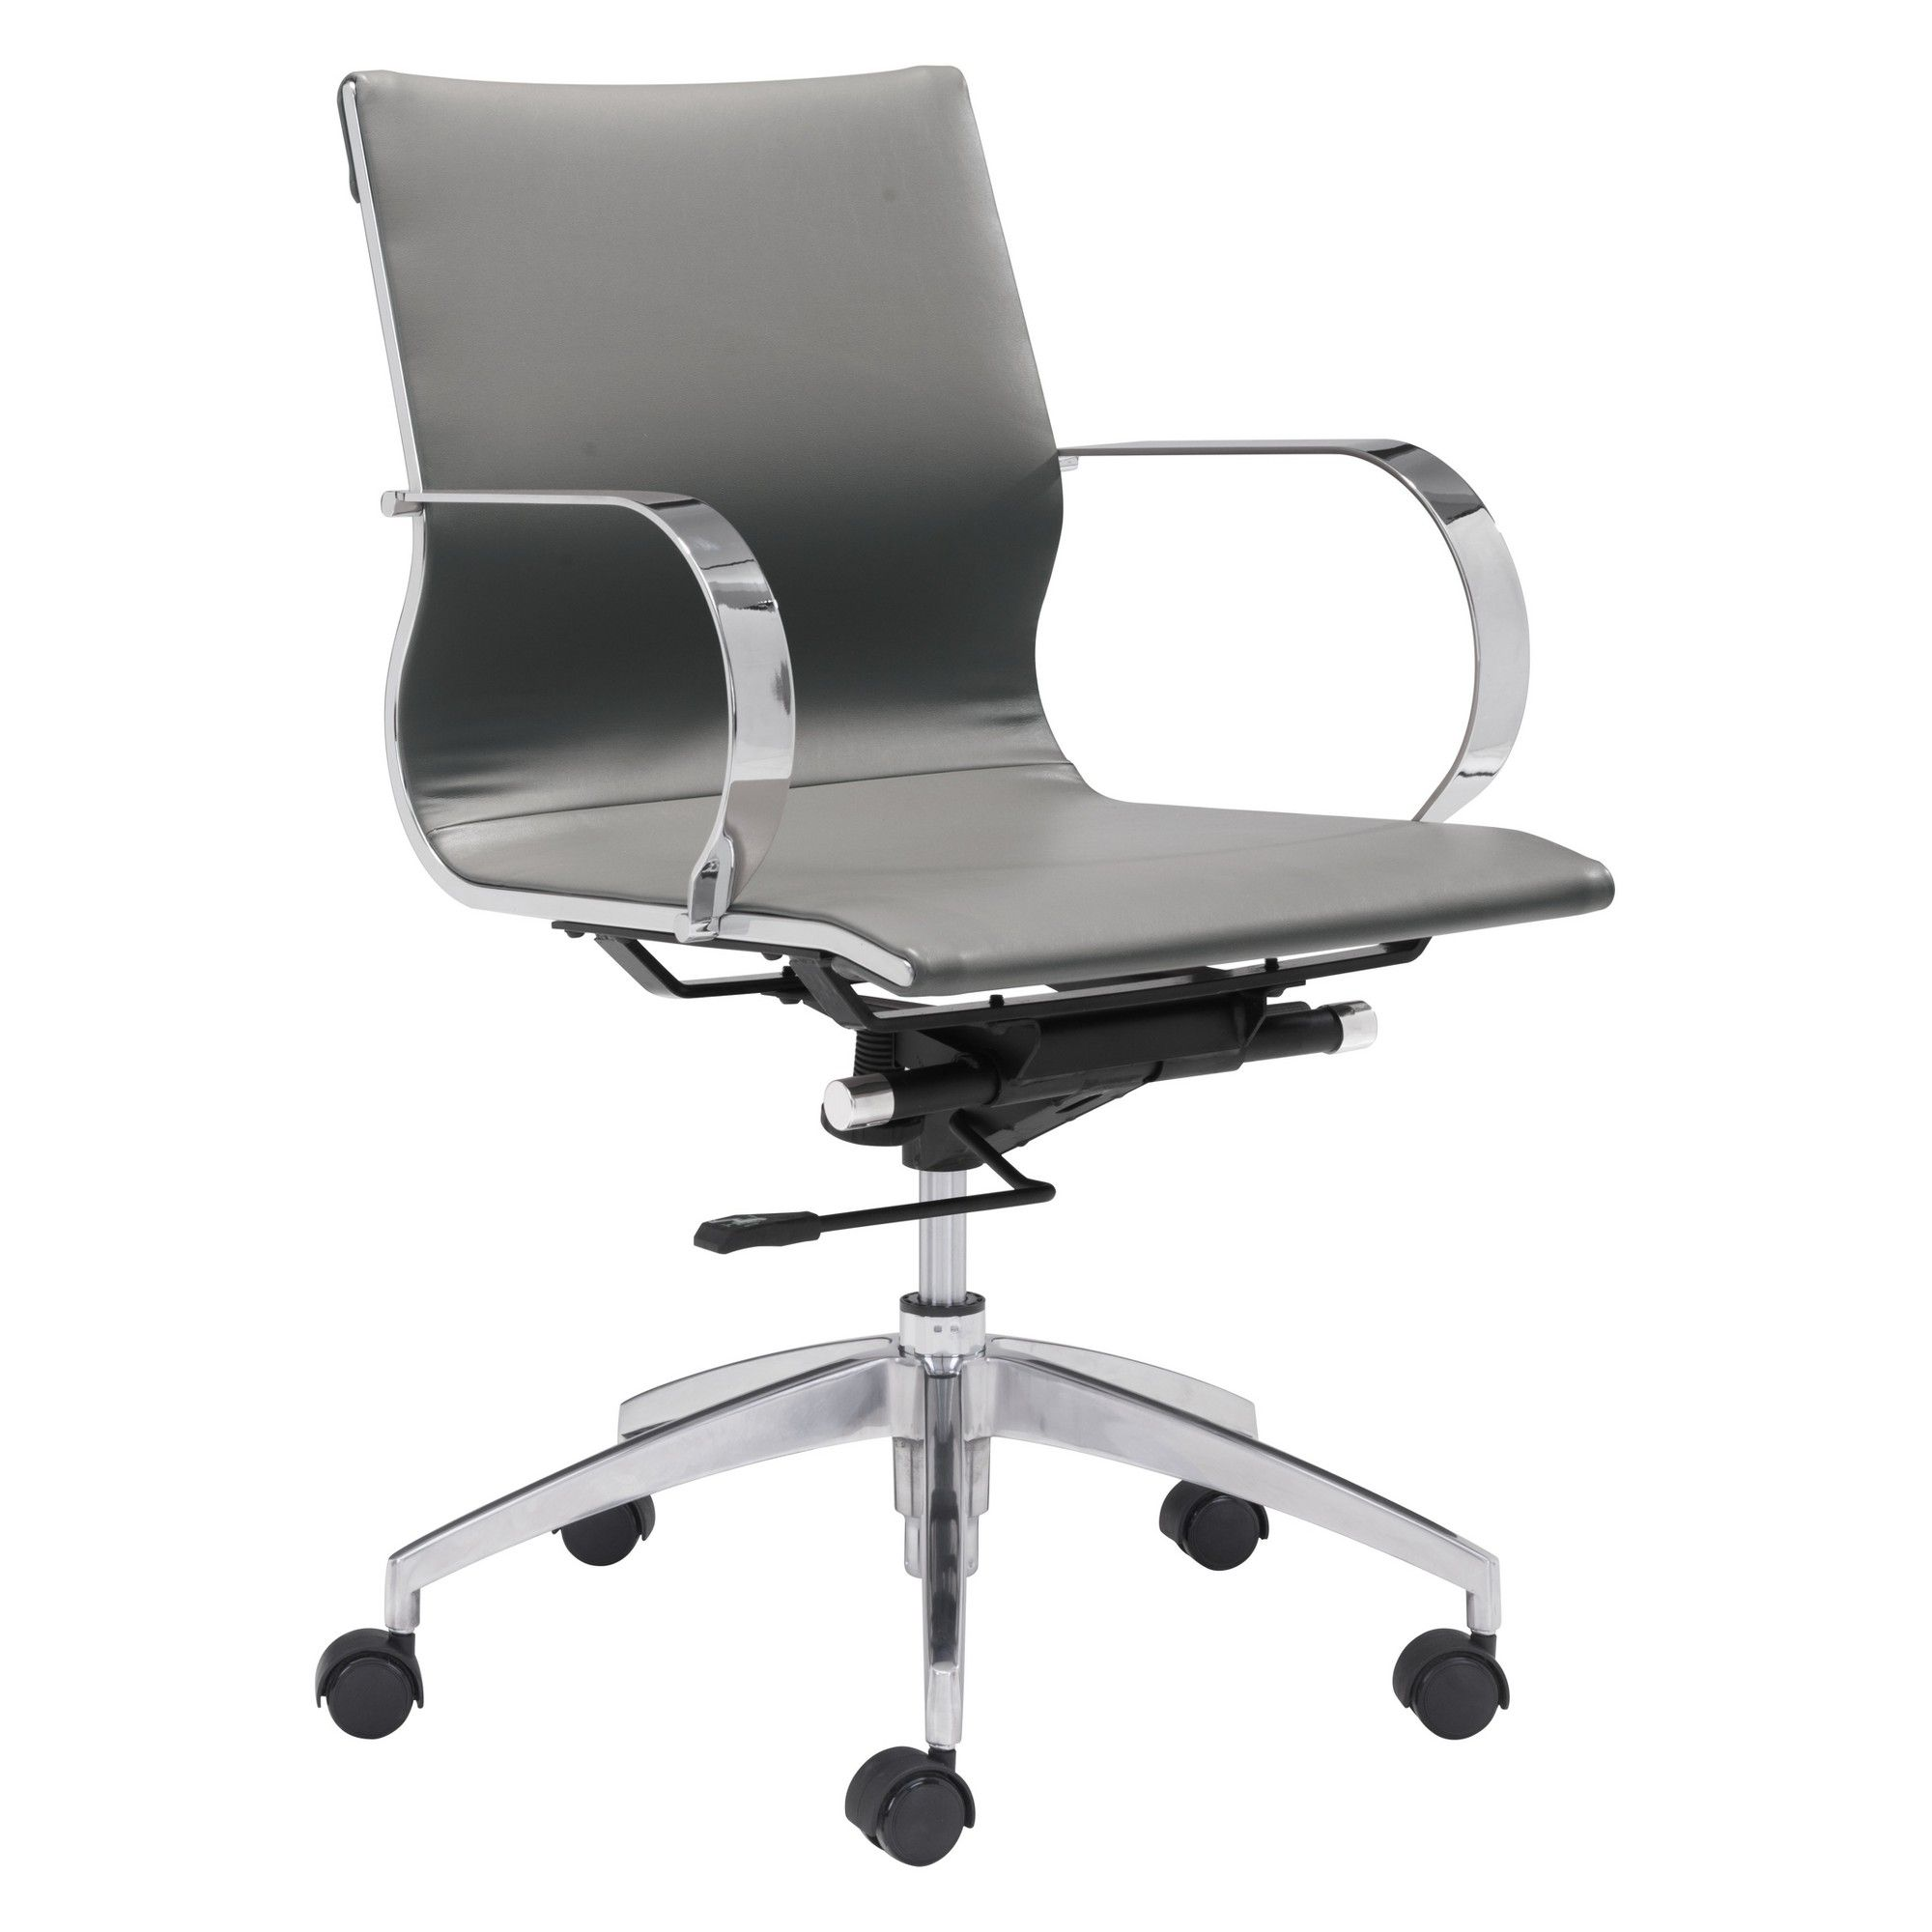 Elegant modern low back adjustable office chair gray zm home